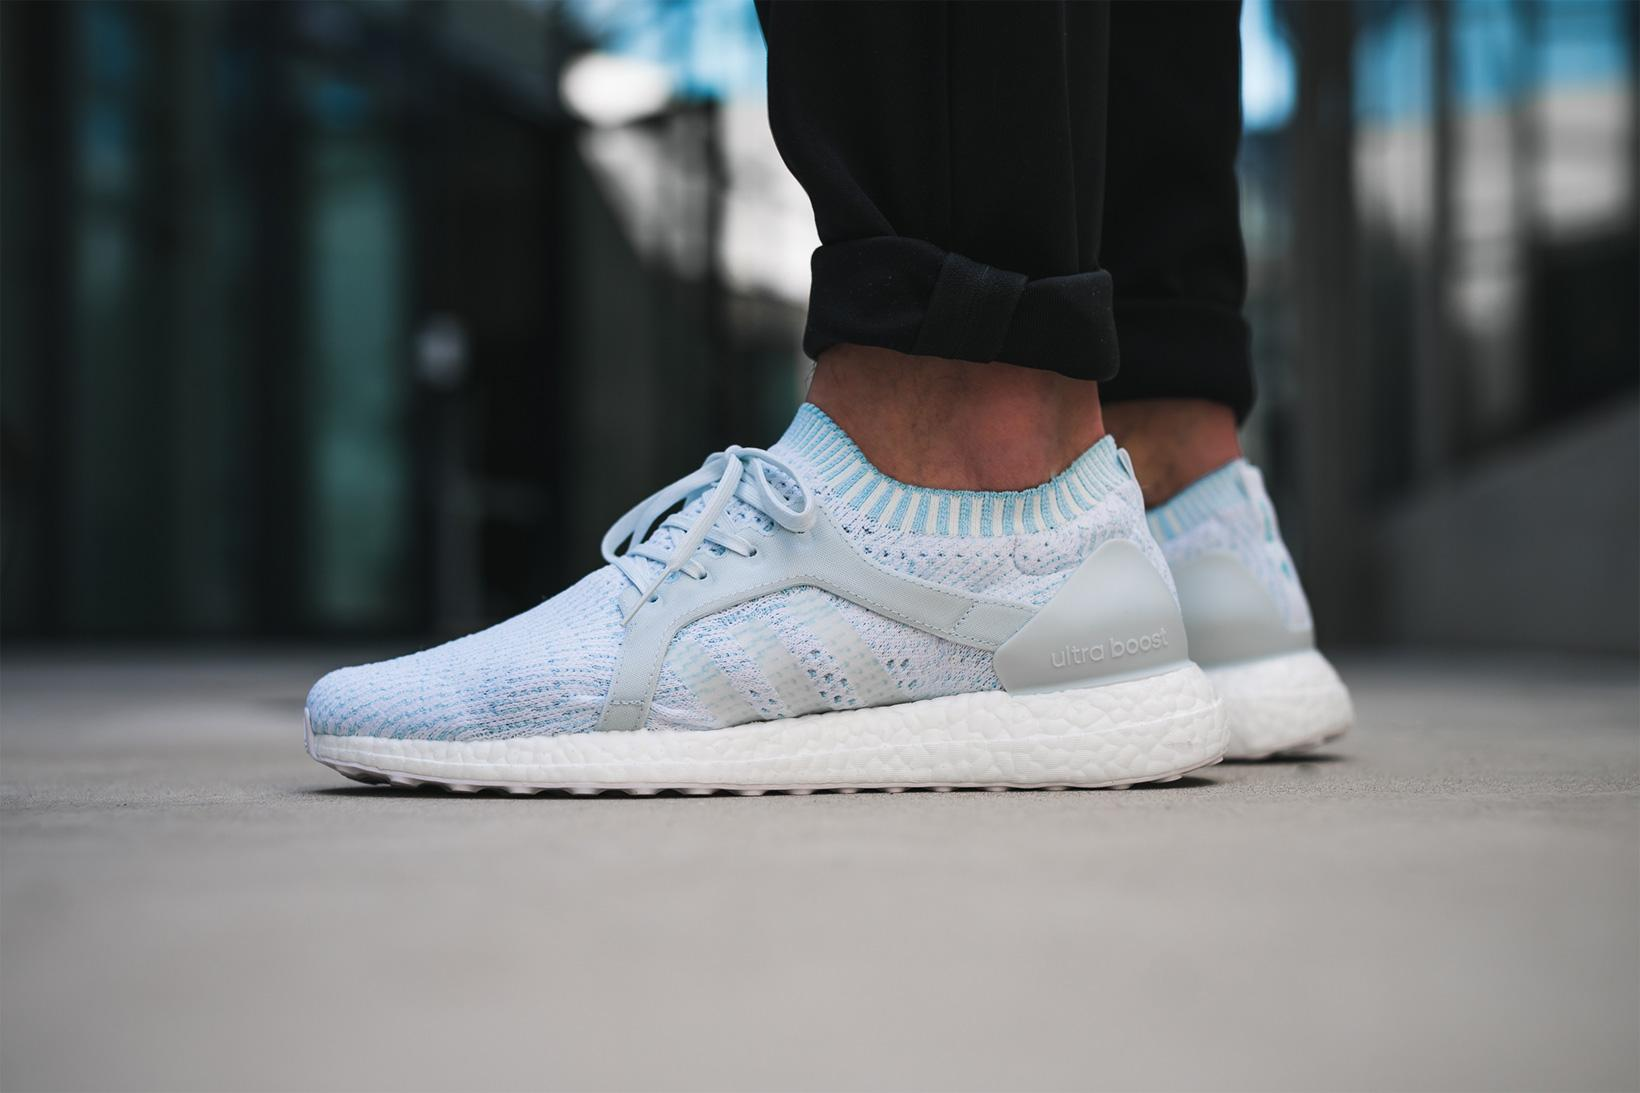 Adidas Parley Ultraboost X Uncaged On Feet Look